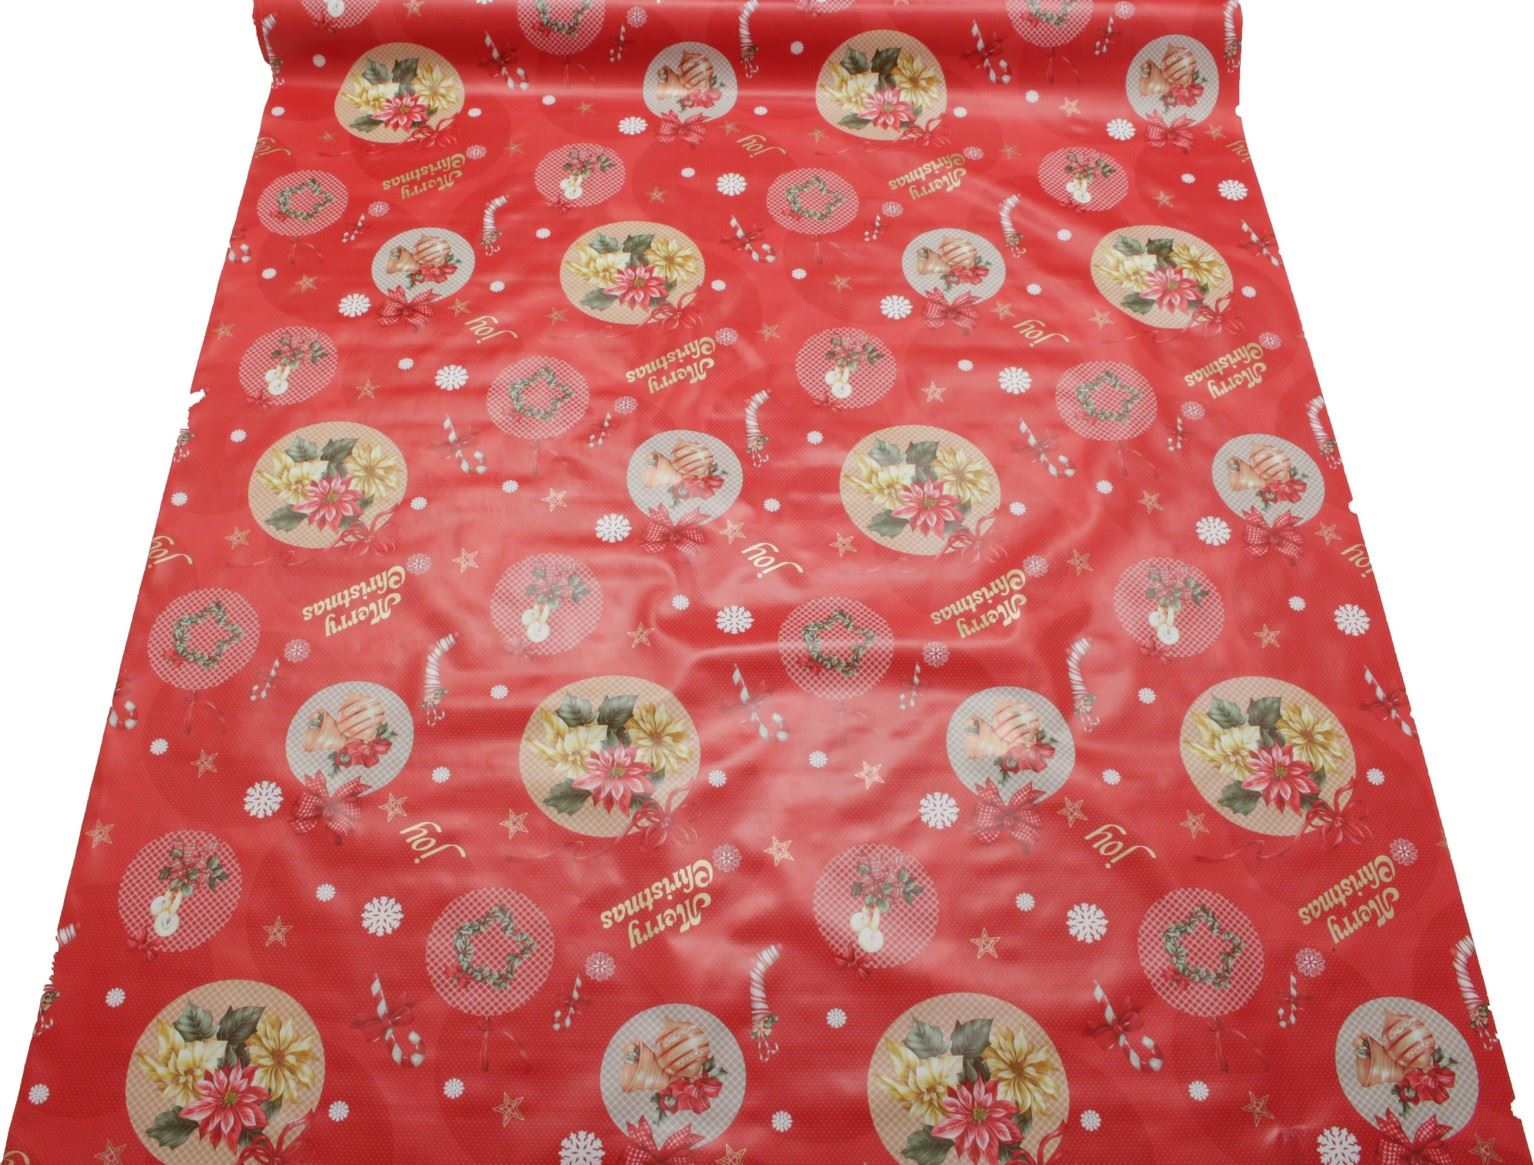 thumbnail 3 - CHRISTMAS PVC OILCLOTH VINYL FABRIC XMAS KITCHEN TABLE WIPECLEAN TABLECLOTHS